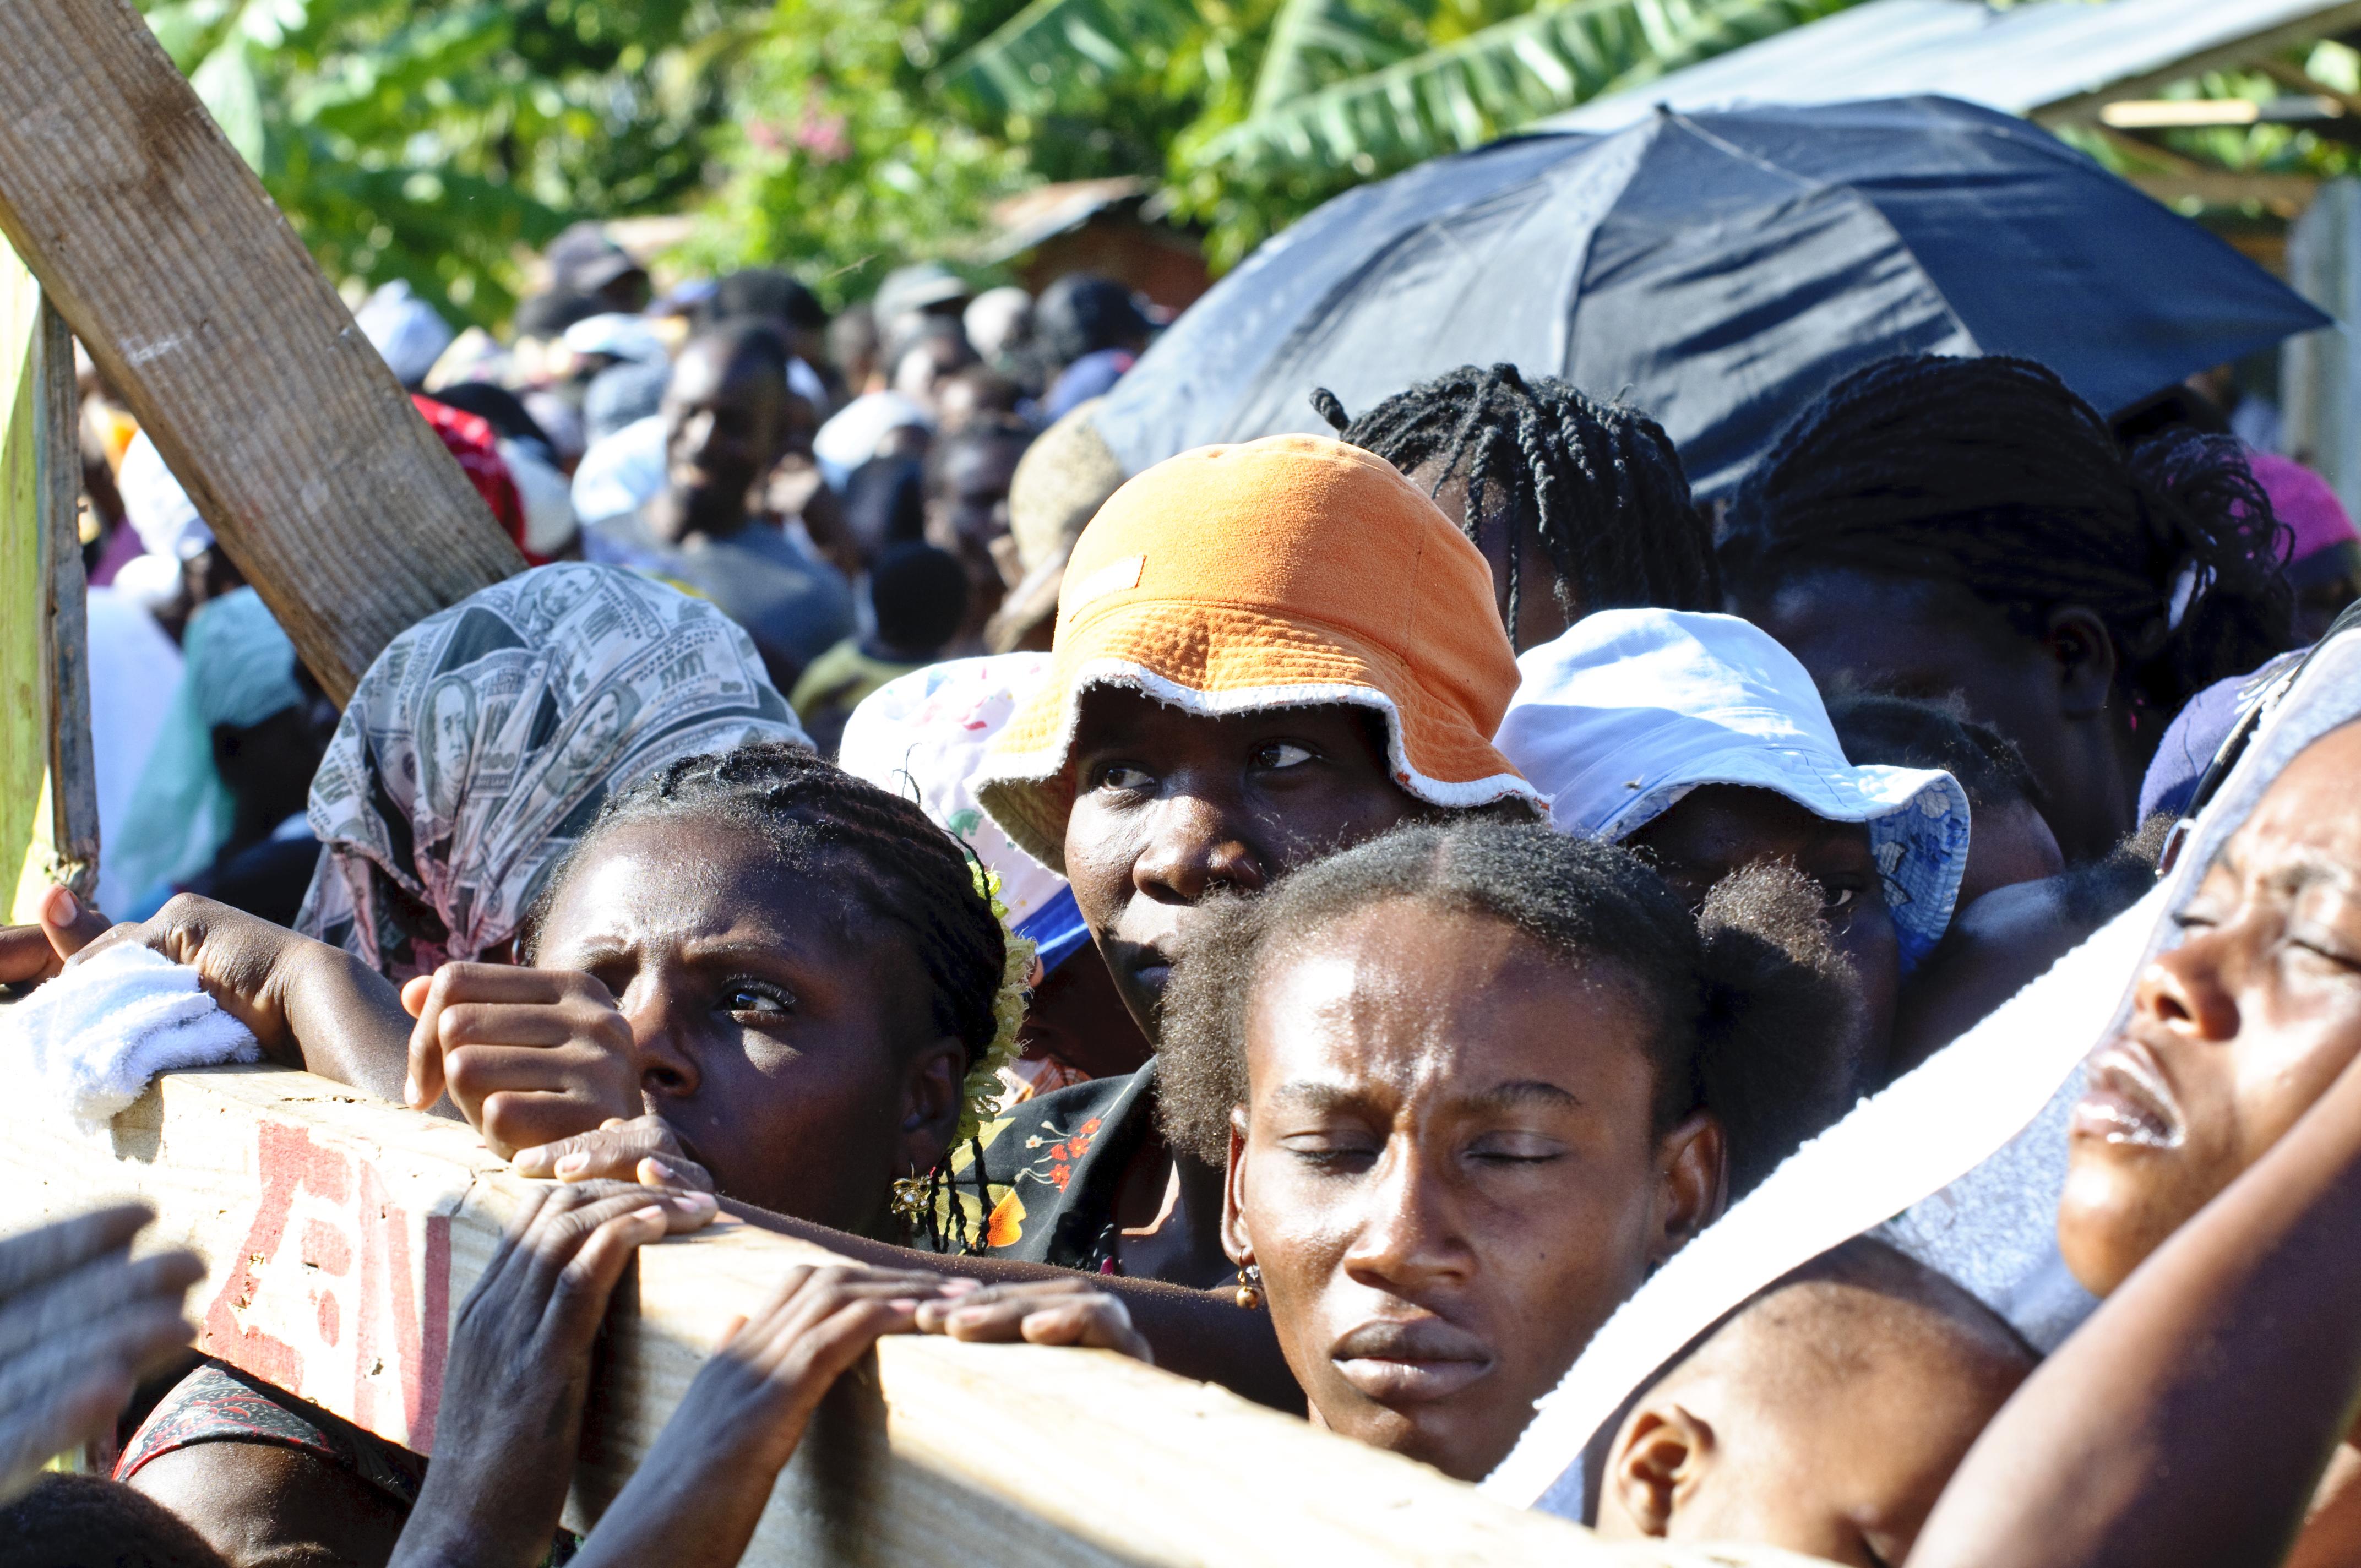 haiti tv emmanuel medical efforts earthquake relief update arcahaie establish pleading clinic community team distanceisnotabarrier tvs